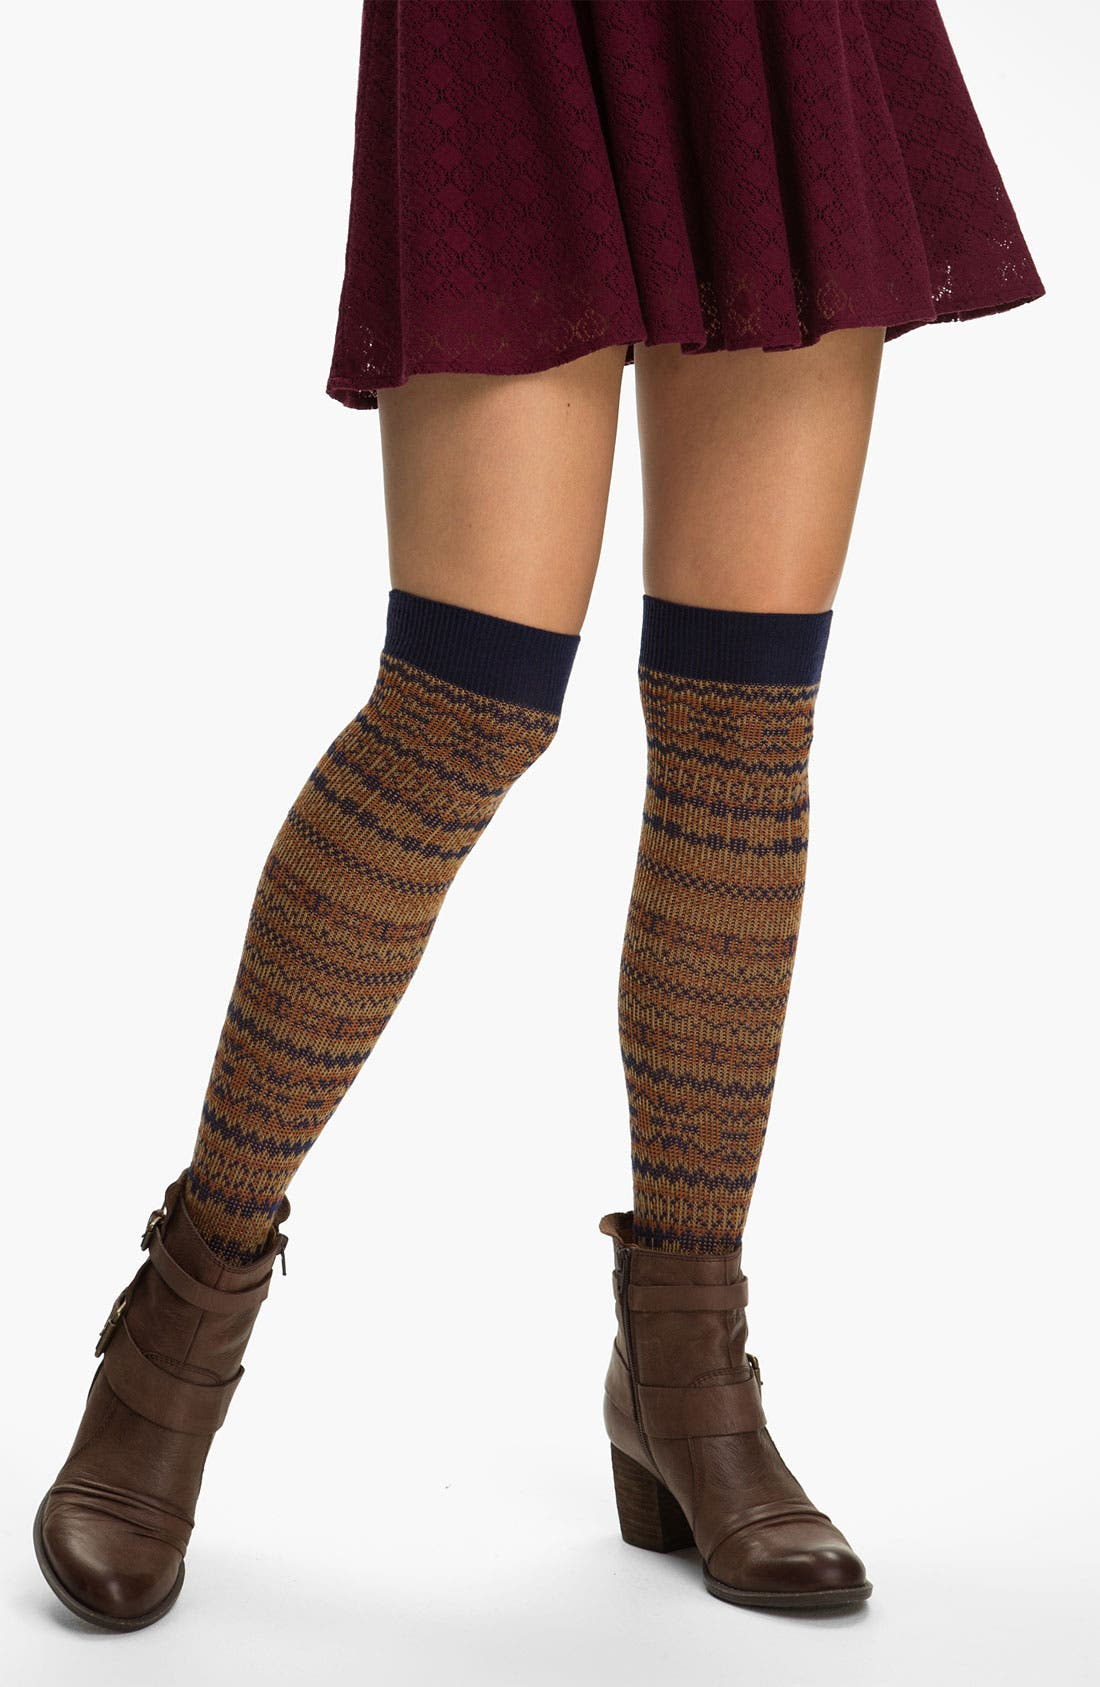 Alternate Image 1 Selected - Free People 'Holland' Over the Knee Socks